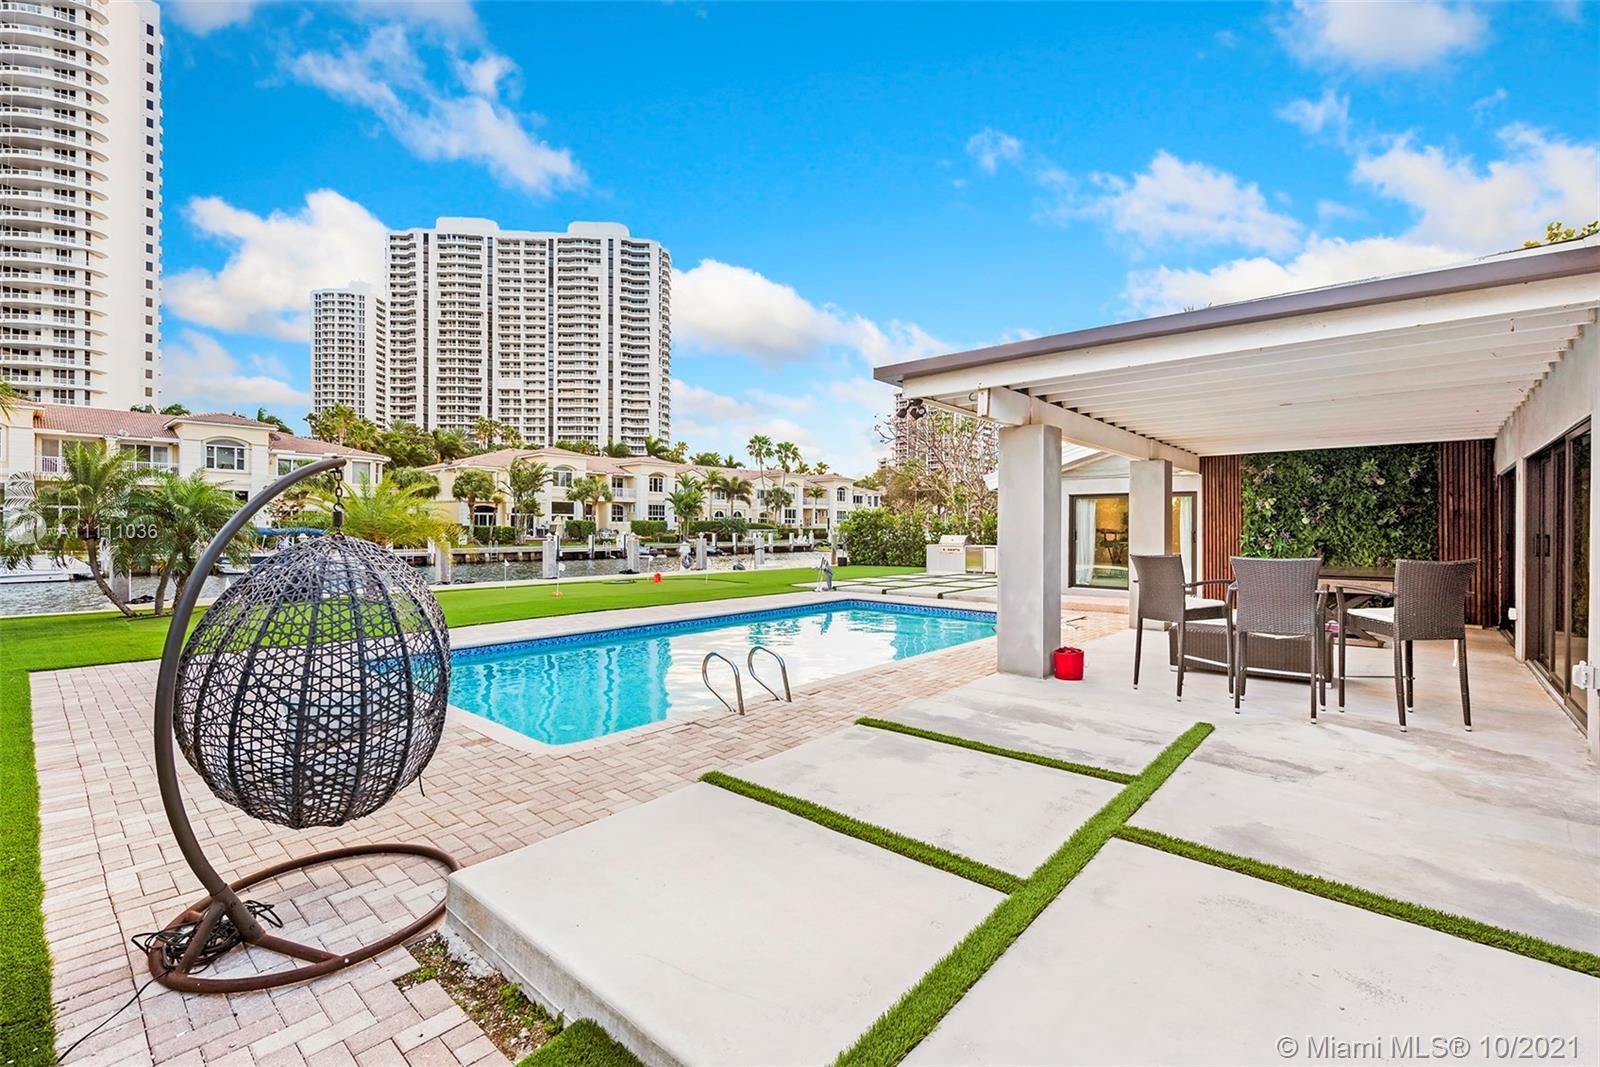 Golden Isles - 207 Holiday Dr, Hallandale Beach, FL 33009